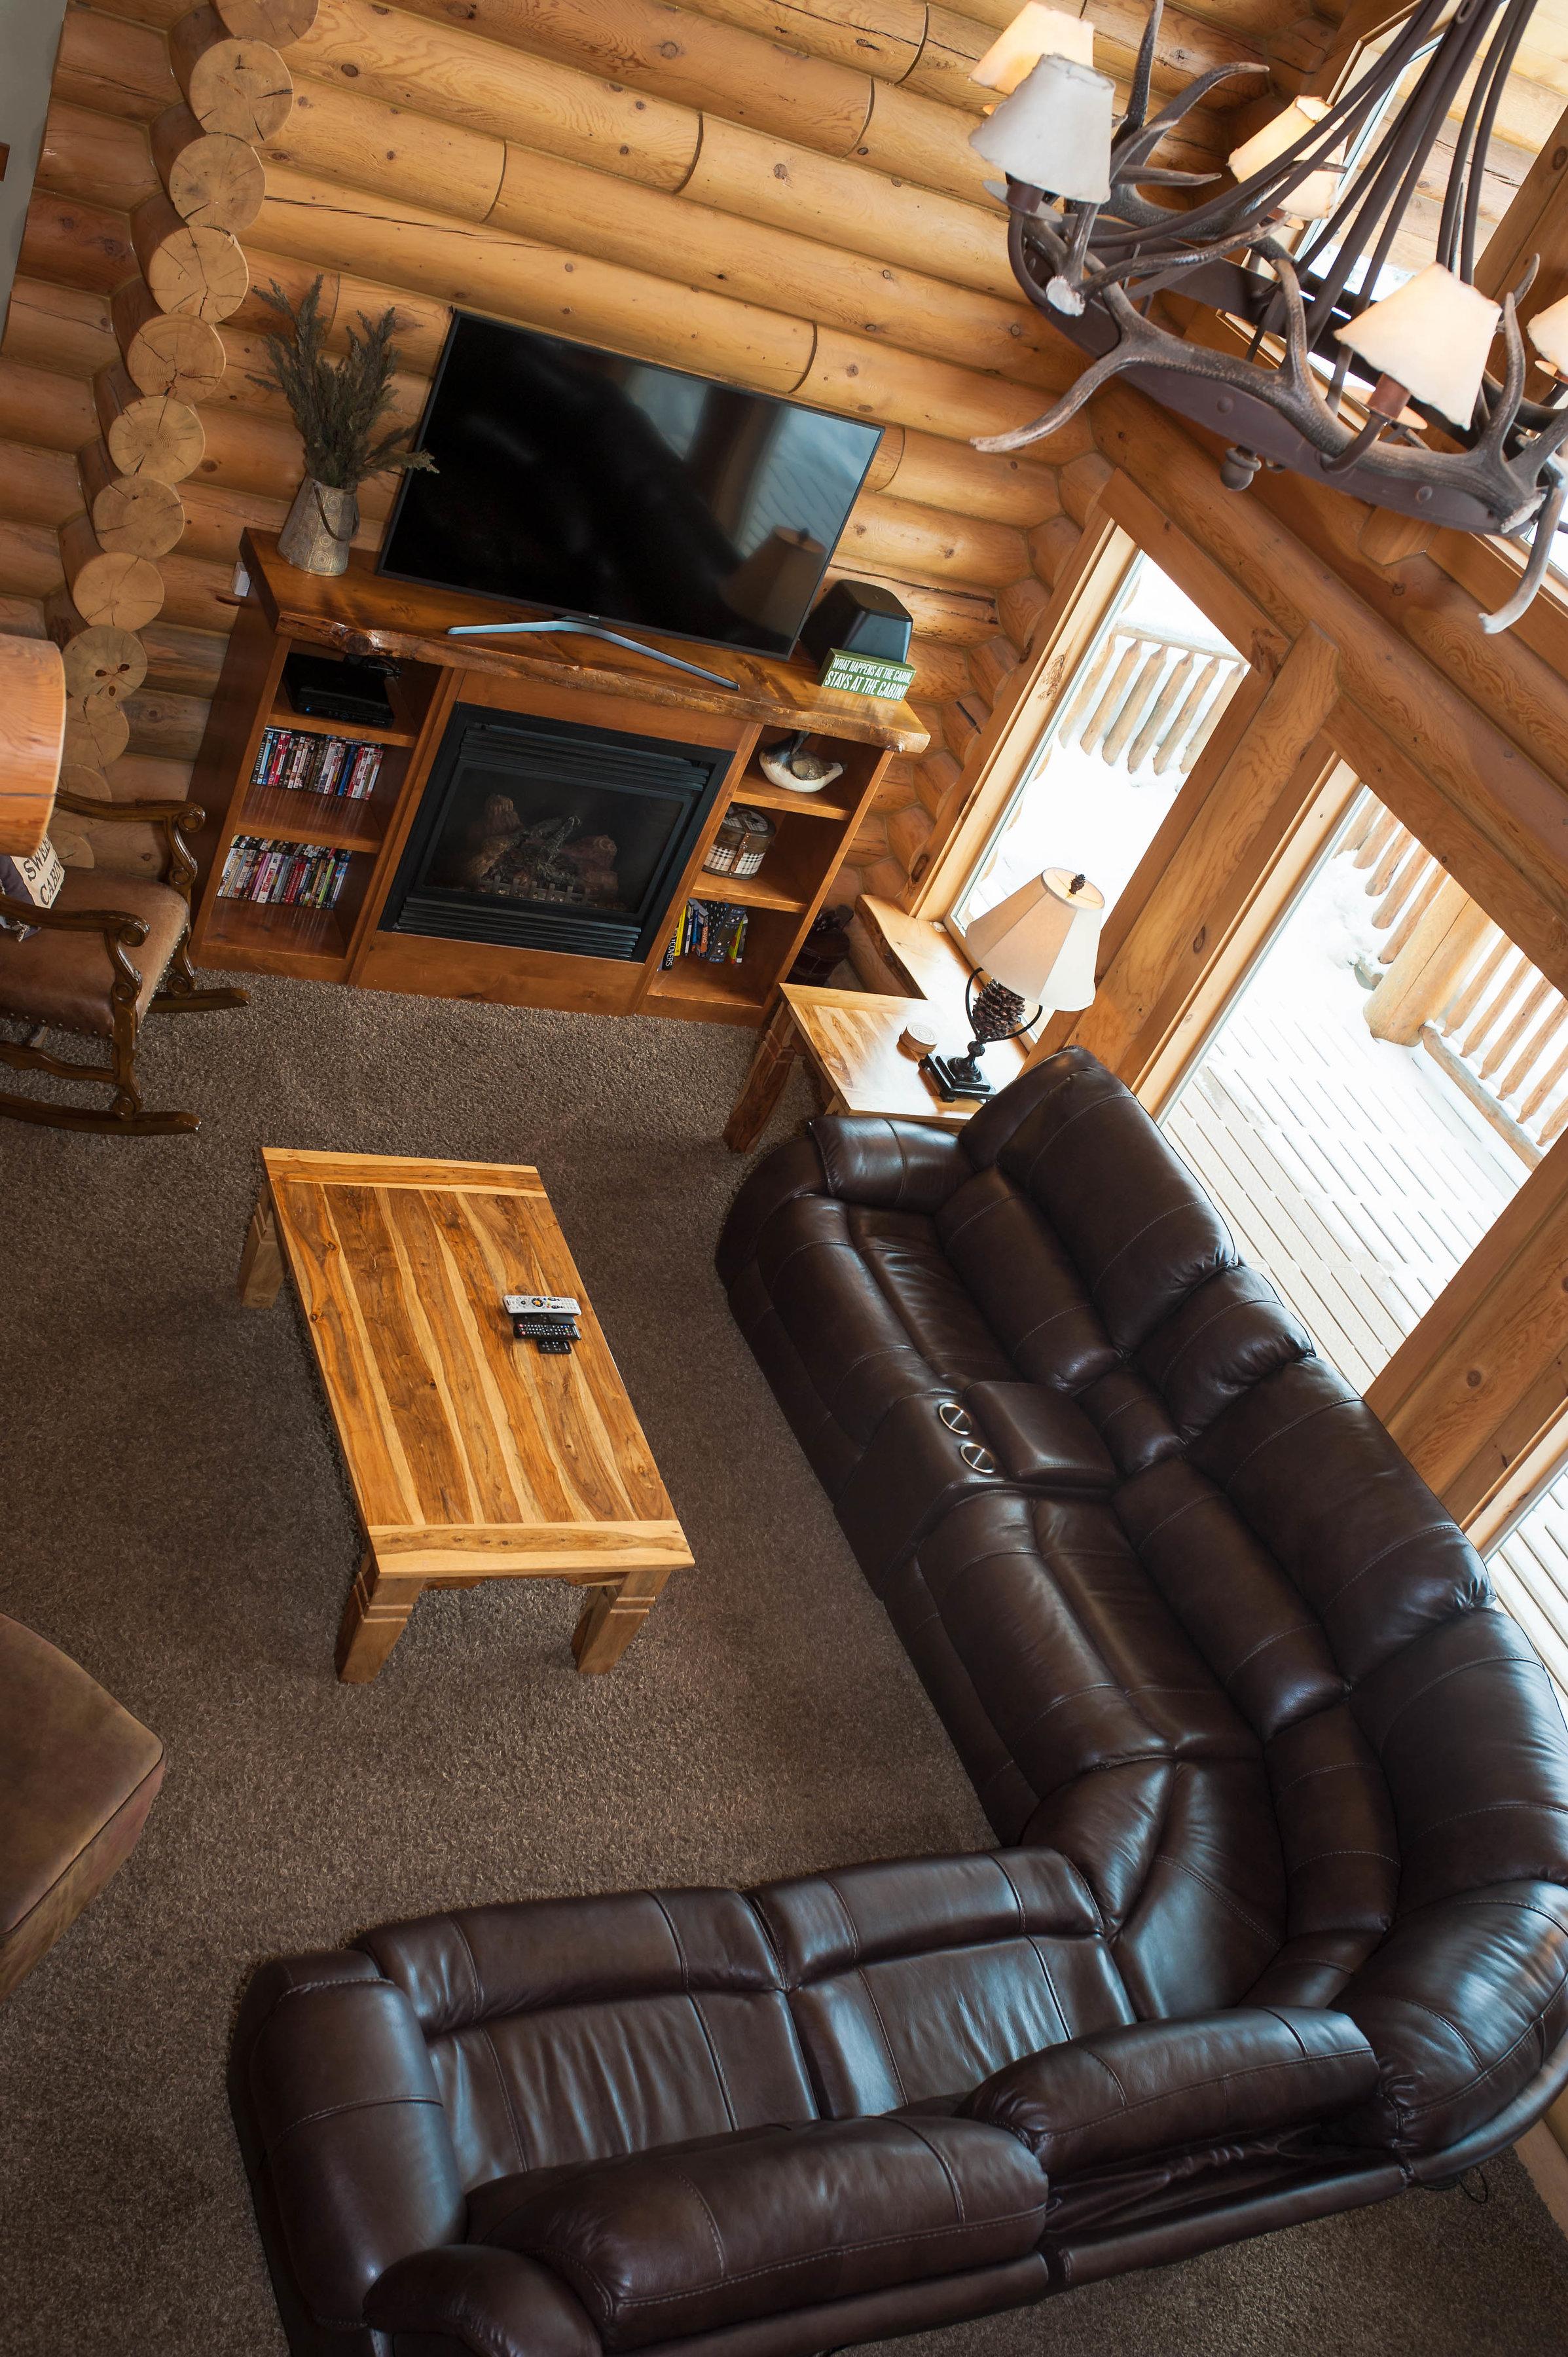 6. C67 Loft to Living Room